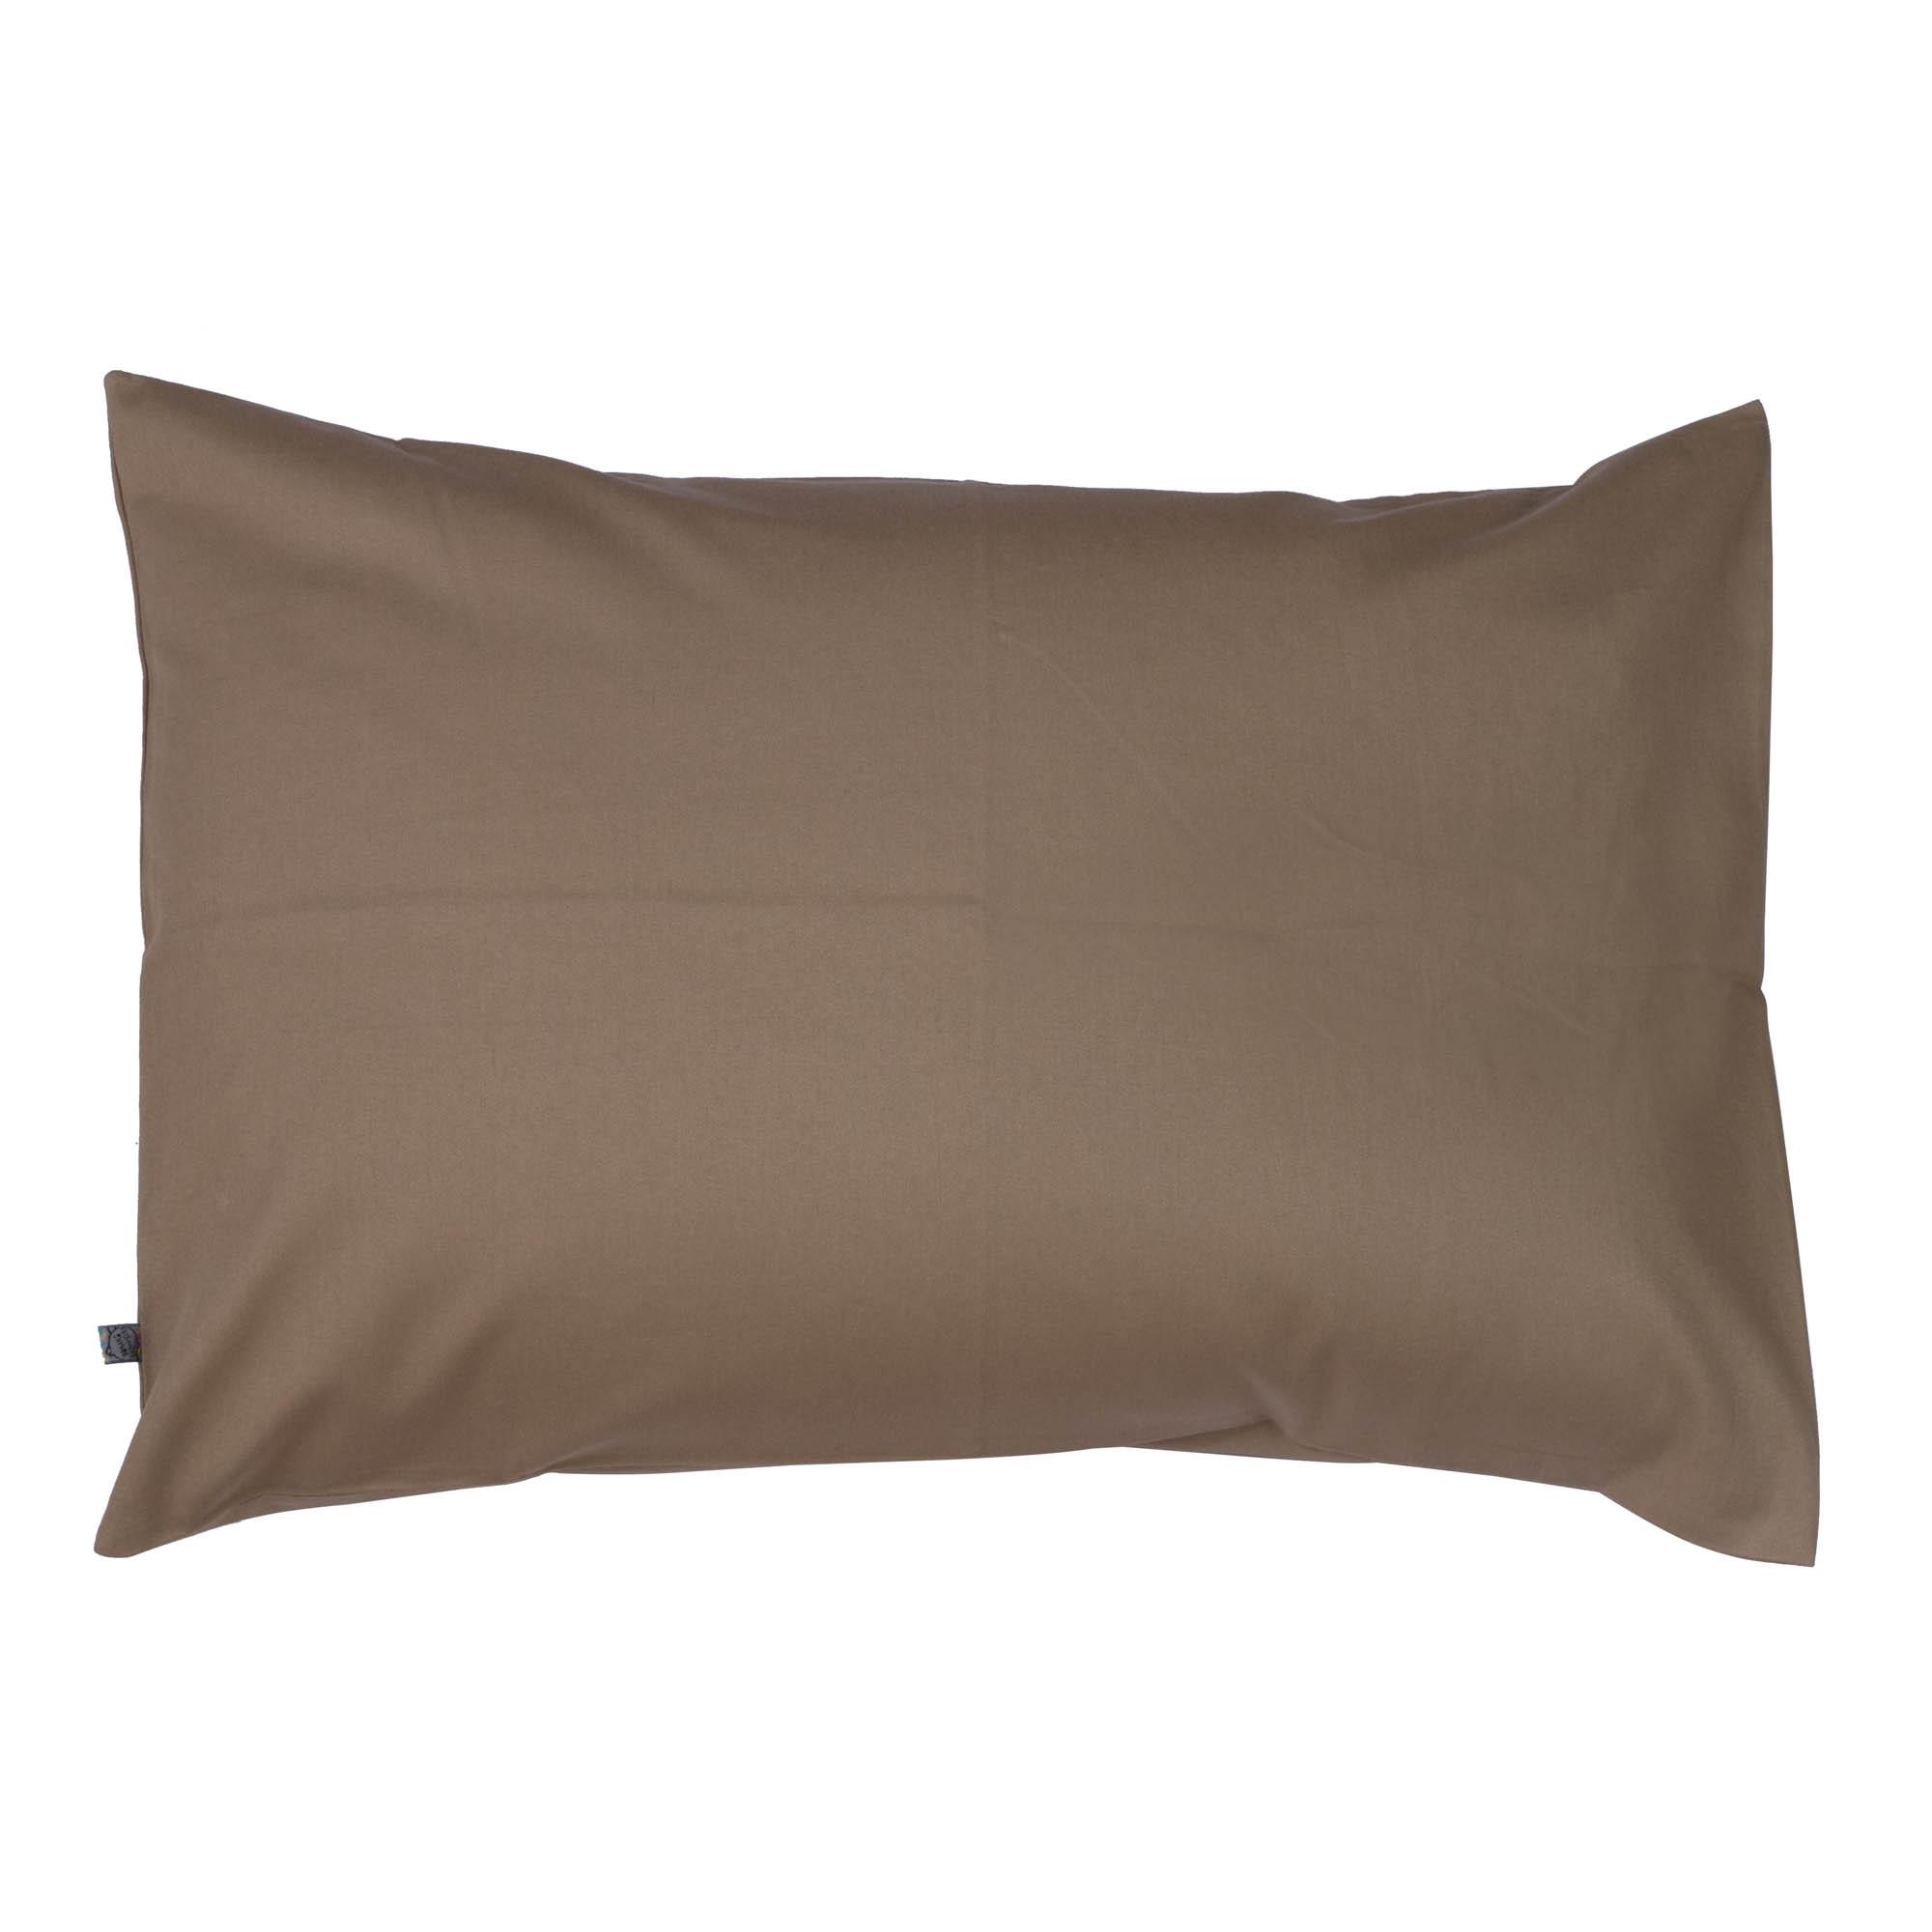 Porta travesseiro liso capuccino